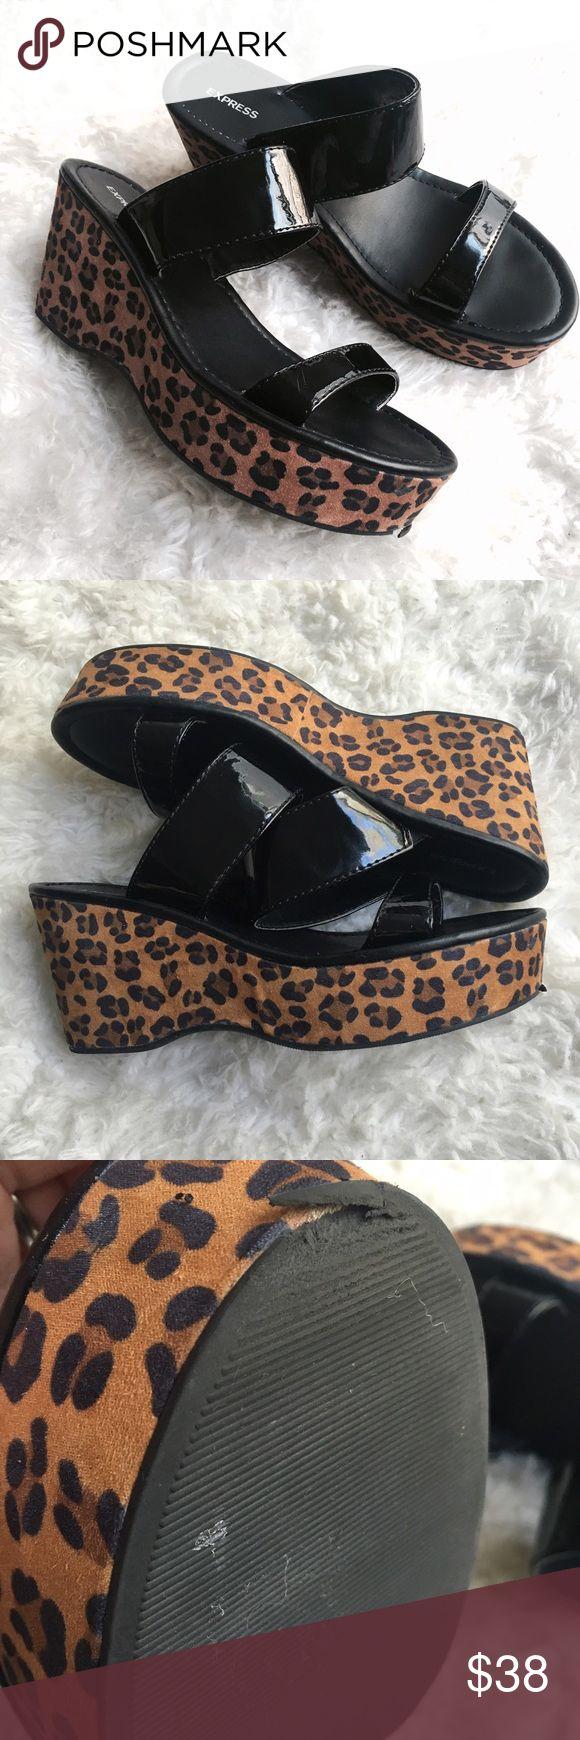 Express Leopard Sandal Platform Shoes Sz 8 Express   Women's   Sz 8   Leopard Print & Black    Platform   Flaw On Front Bottom Of Shoe   Express Shoes Platforms